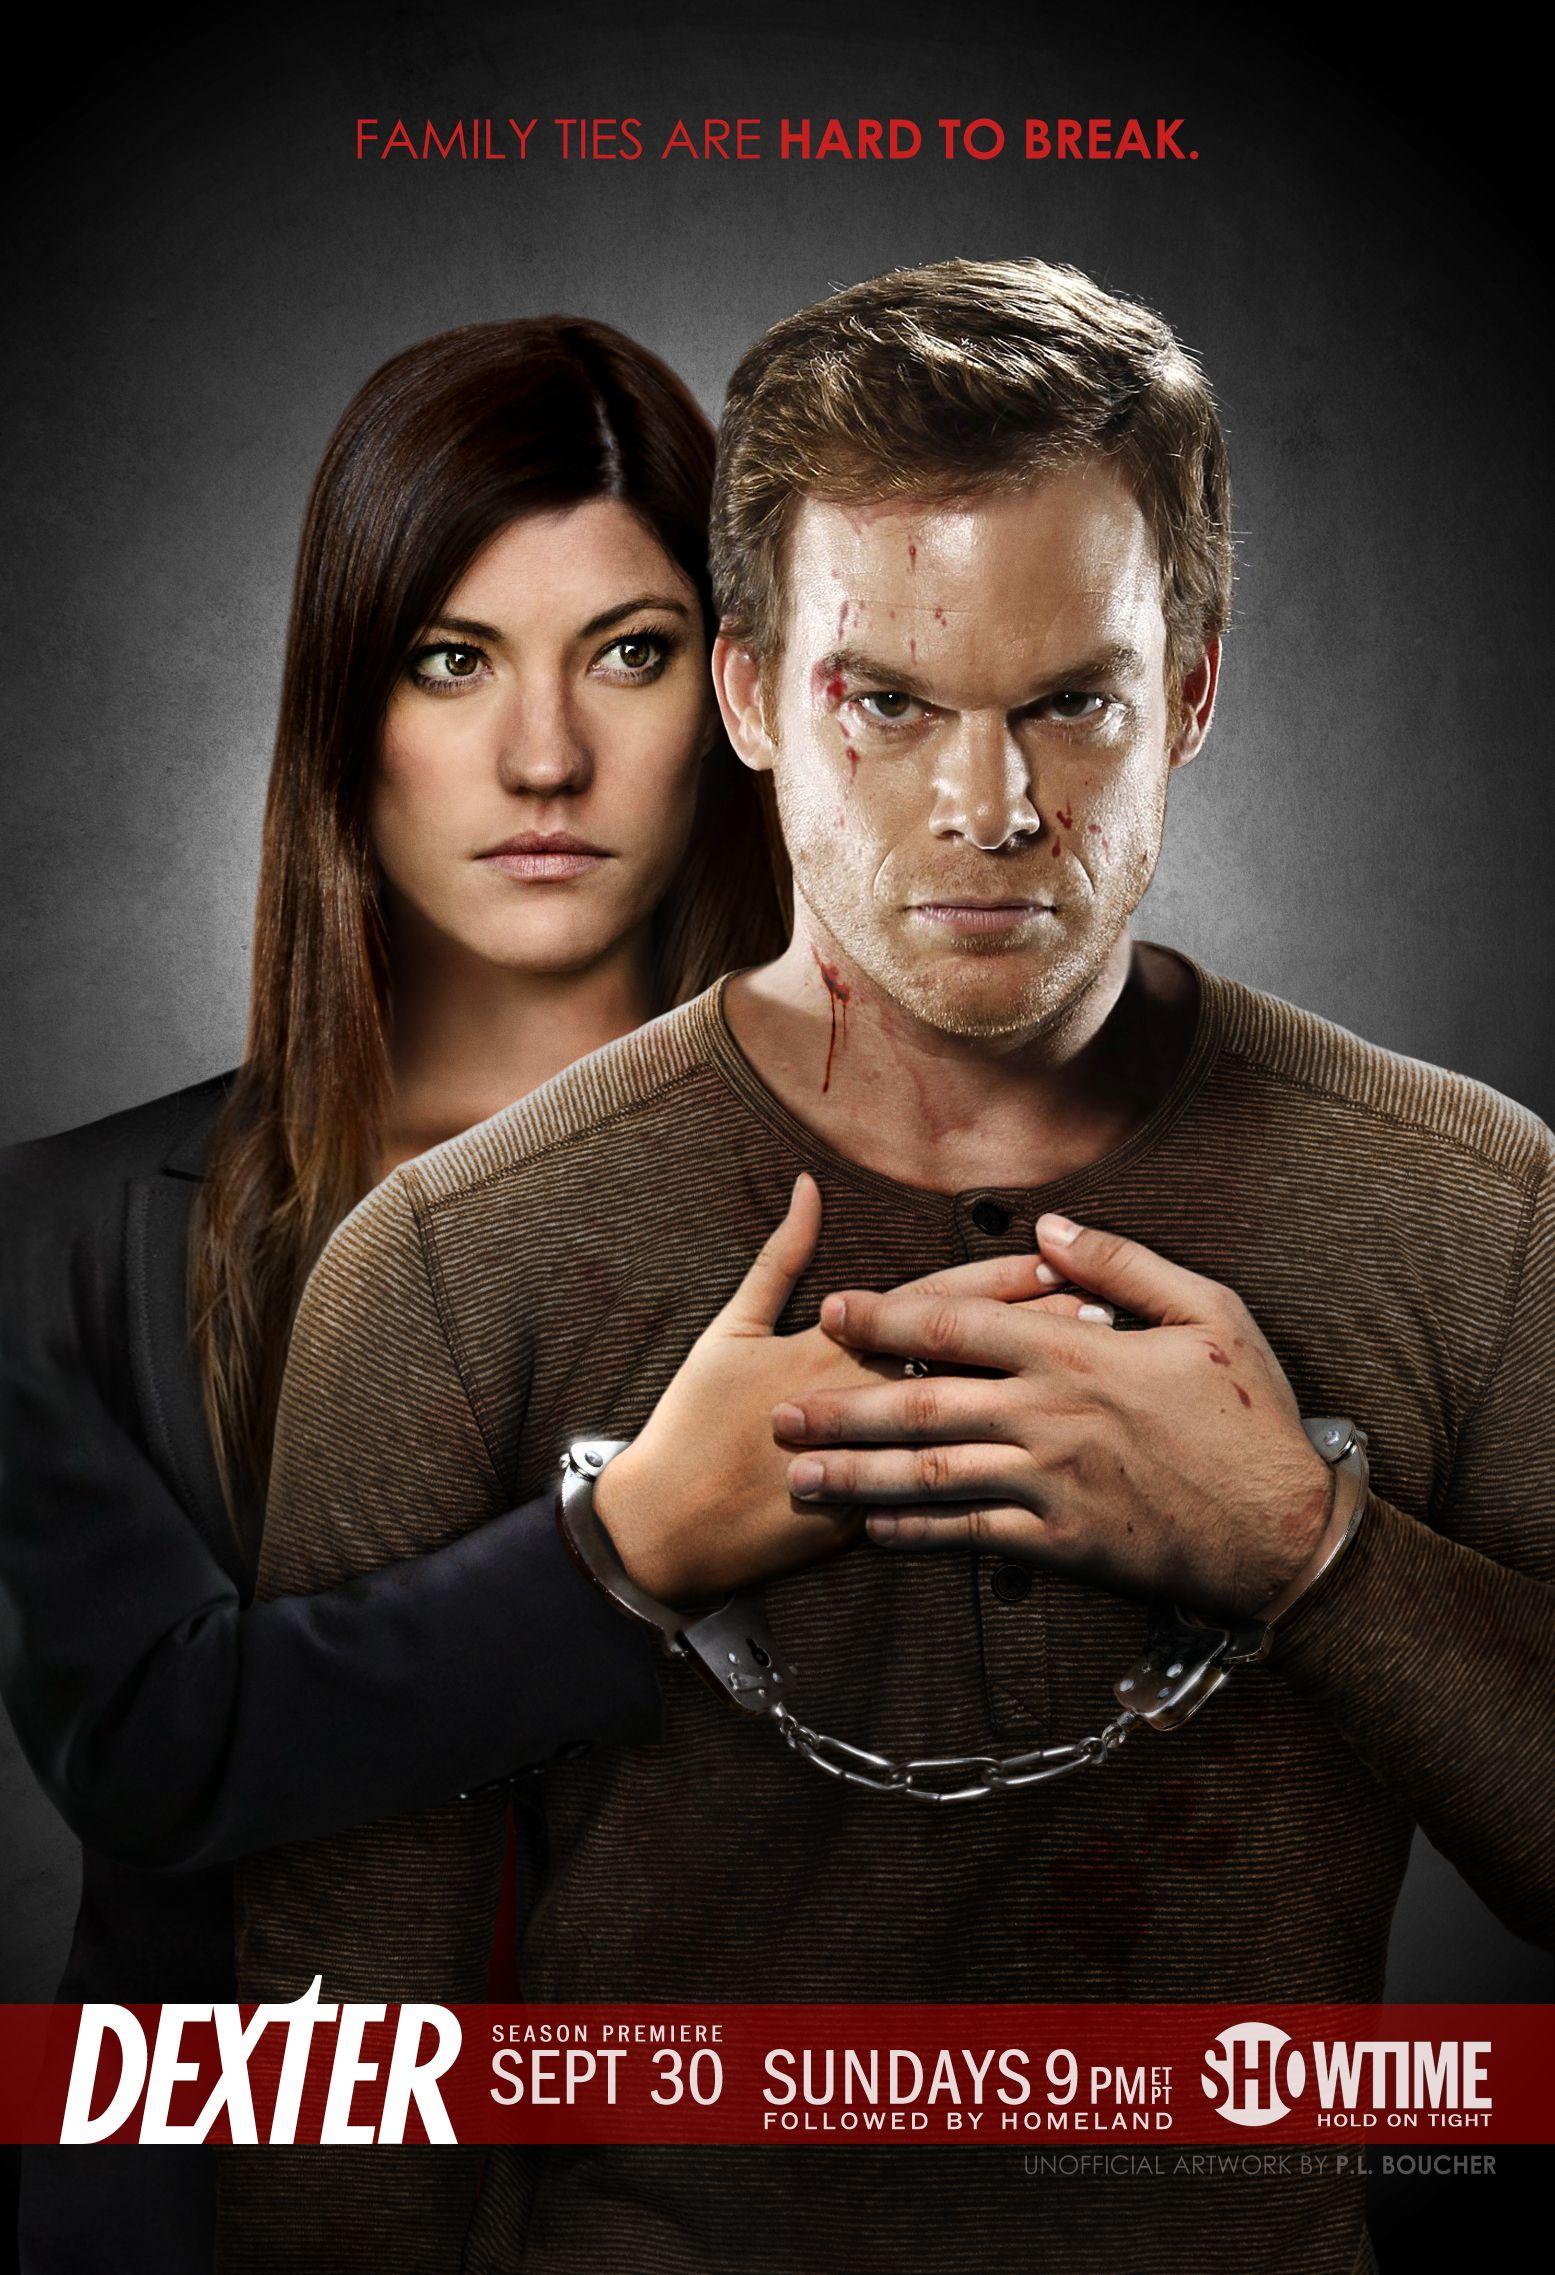 dexter season 7 episode 9 free online